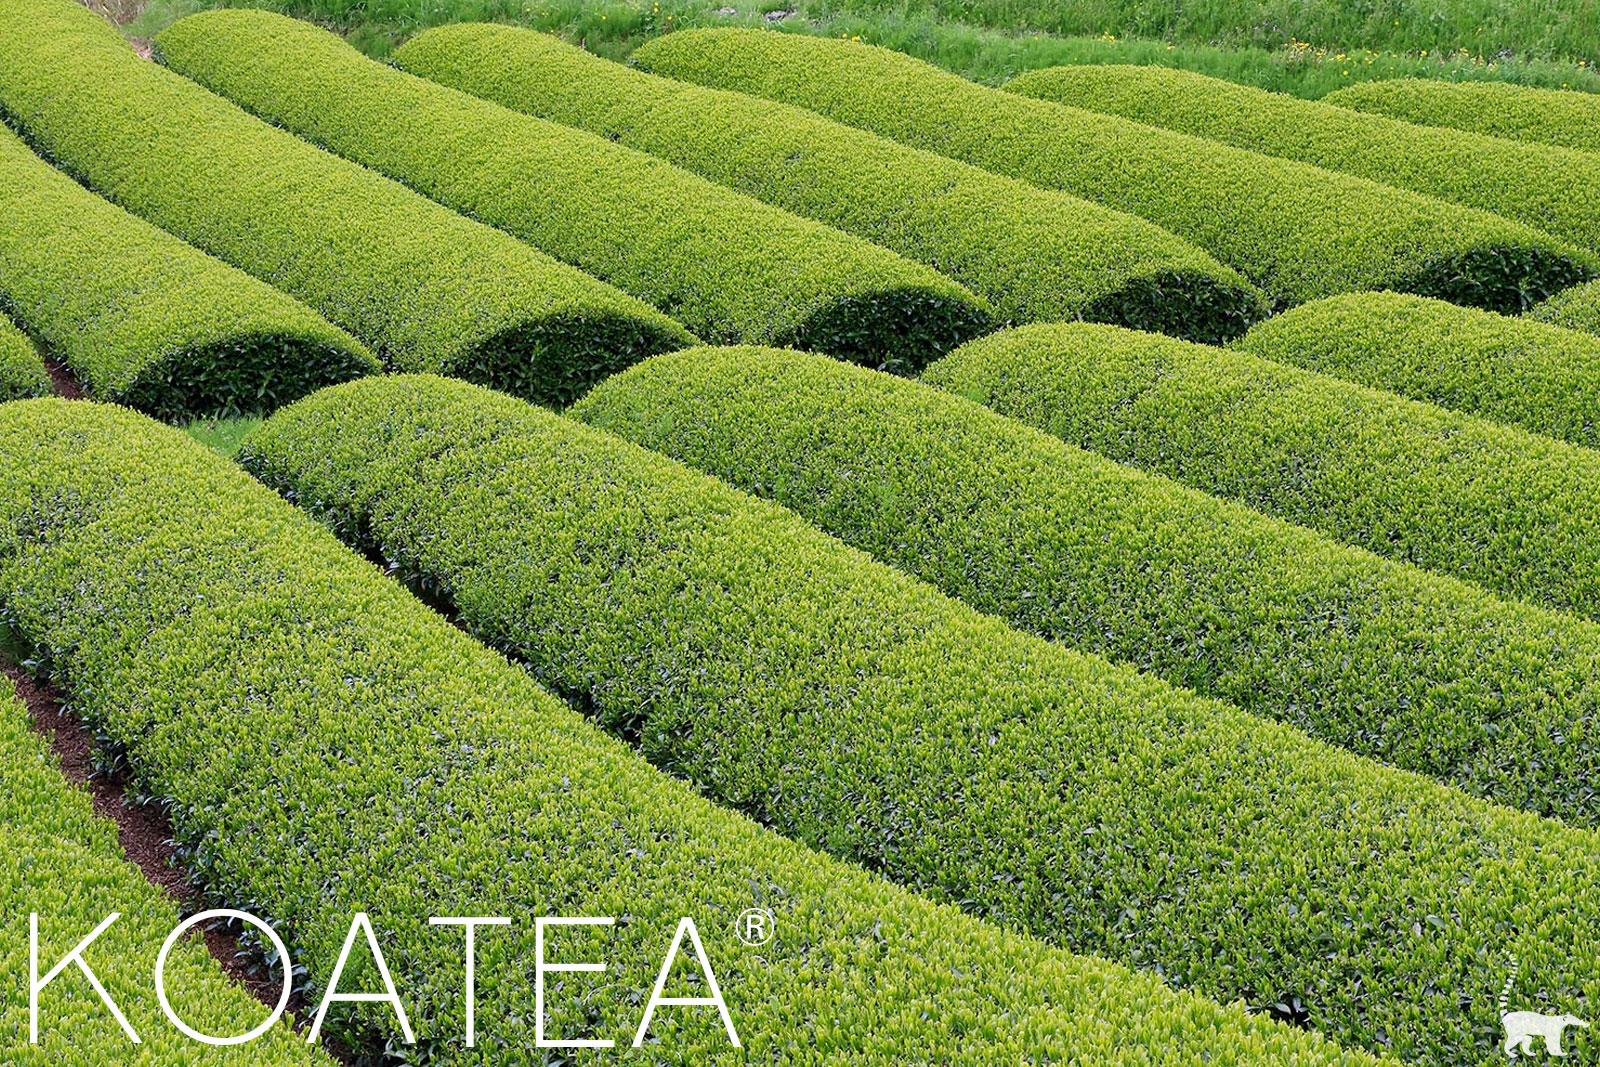 Champ de thé vert Matcha u Japon